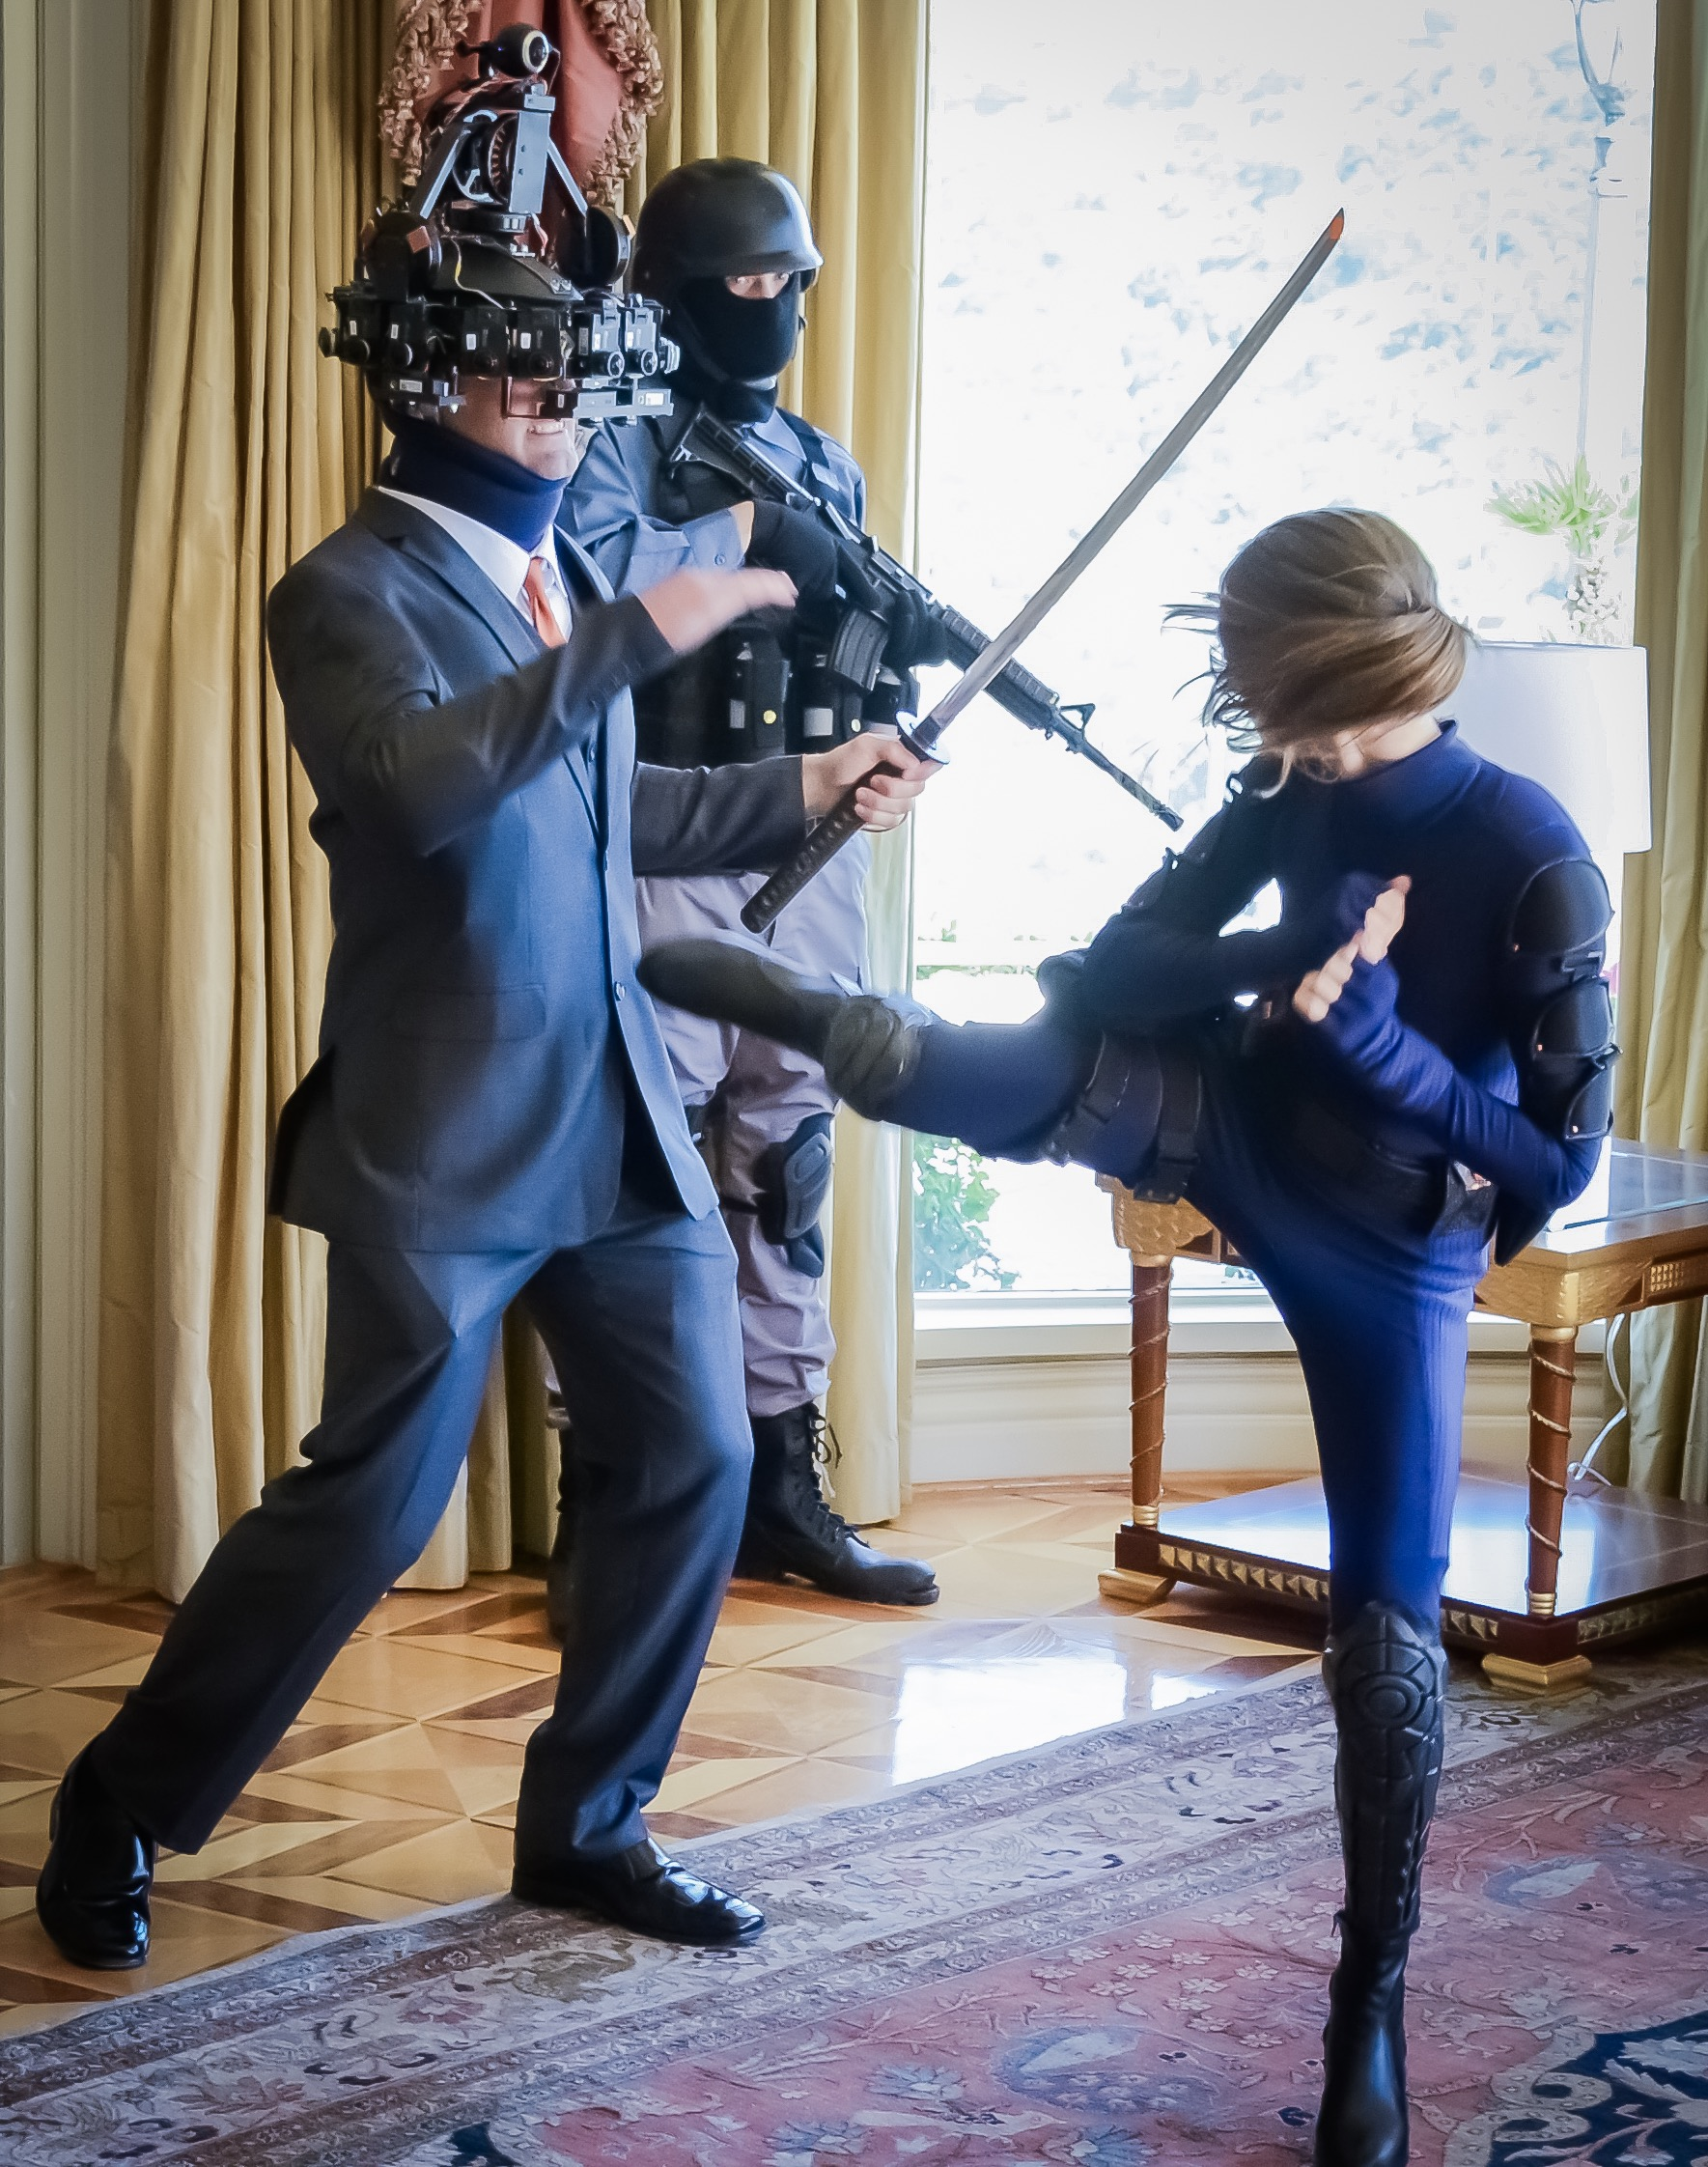 Behind-the-scenes-image-of-Lyndsy-Fonseca-Alexandra-filming-katana-battle-scene-on-VR-Film-AGENT-EMERSON.-Photo-credit_-Billy-Bennight-4